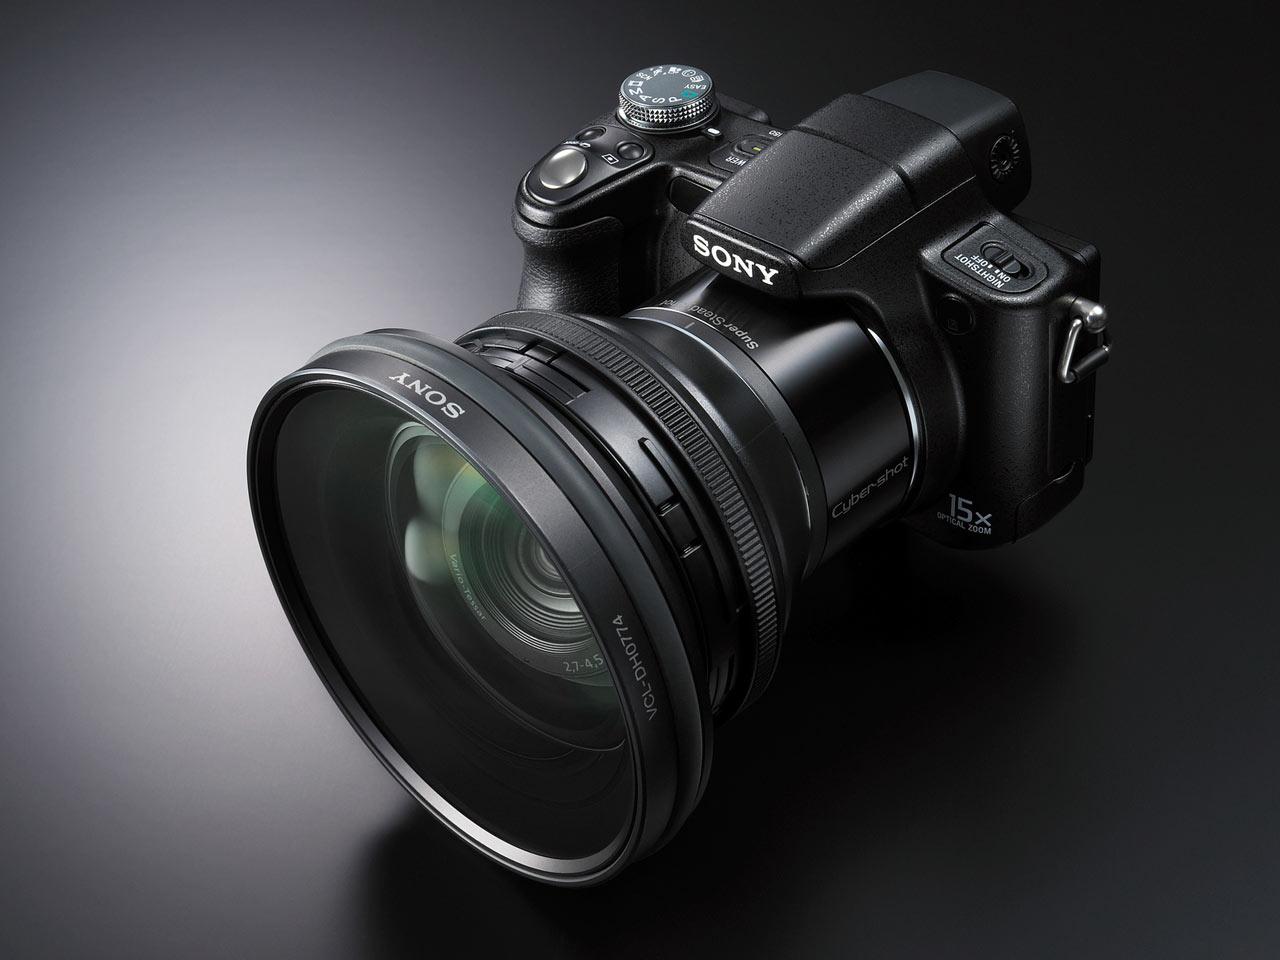 sony dsc h50 digital photography review rh dpreview com Sony DSC H50 Review Accessories Sony H50